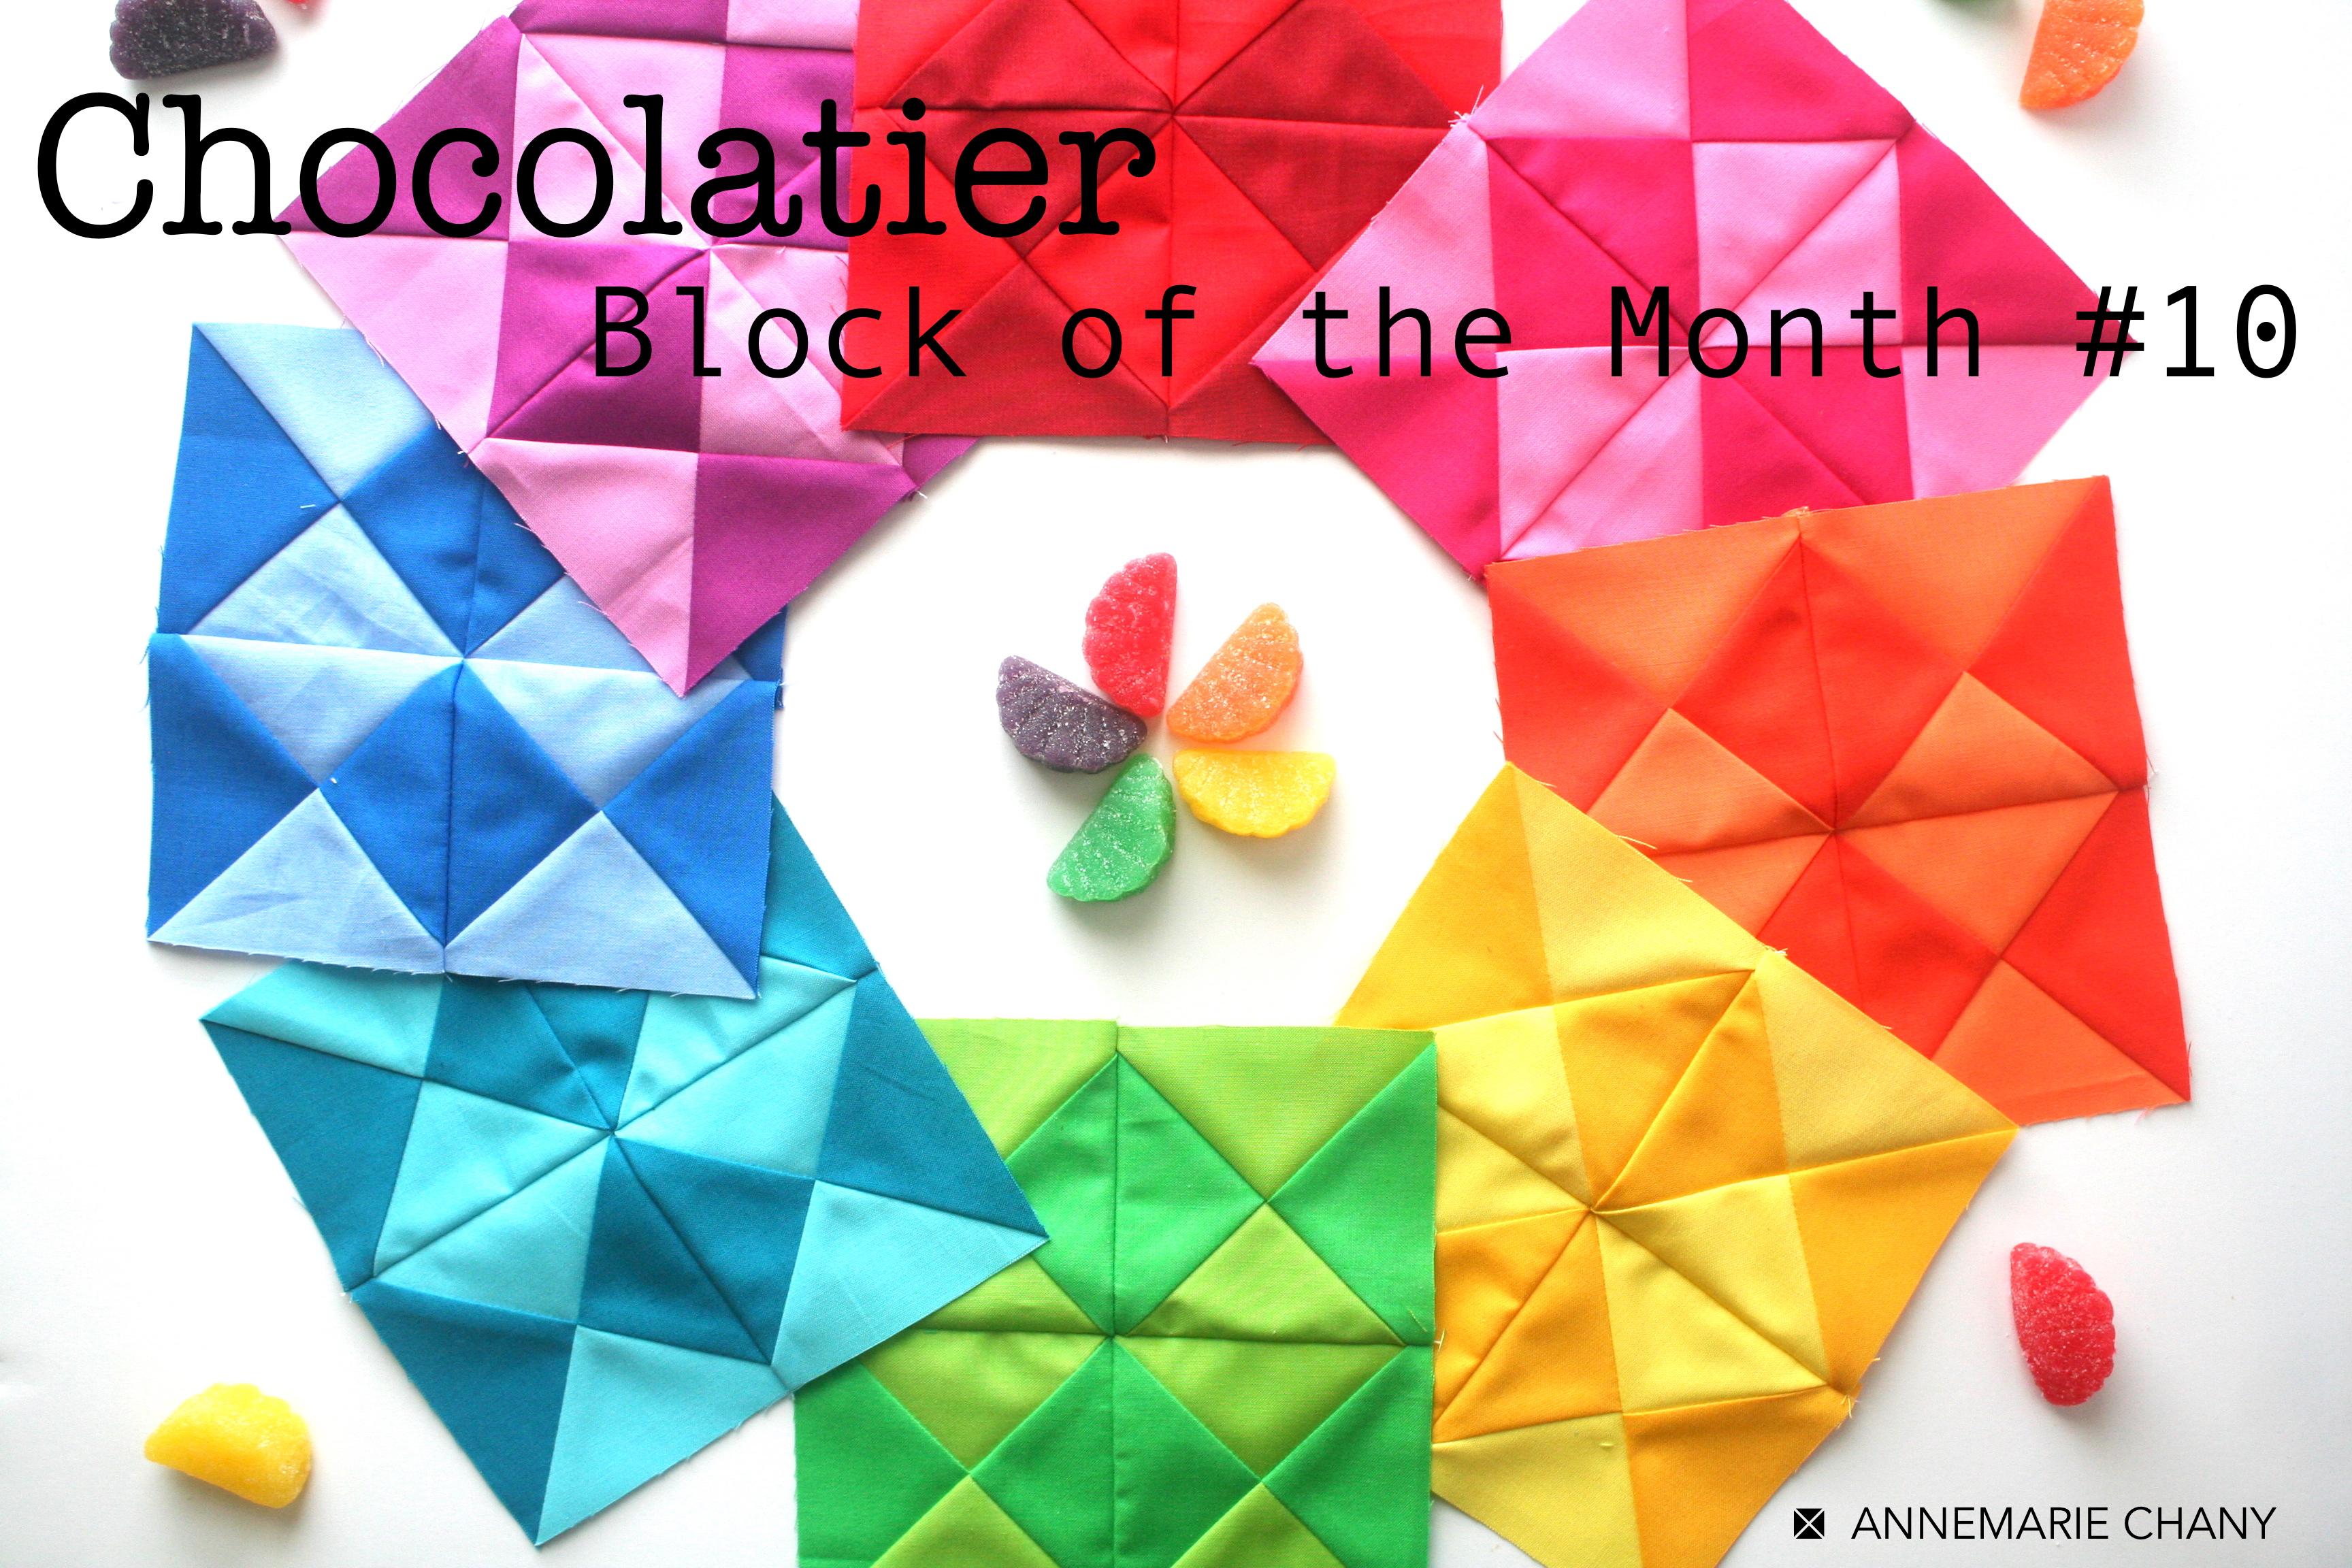 Chocolatier Block of the Month Argyle Hourglass Blocks